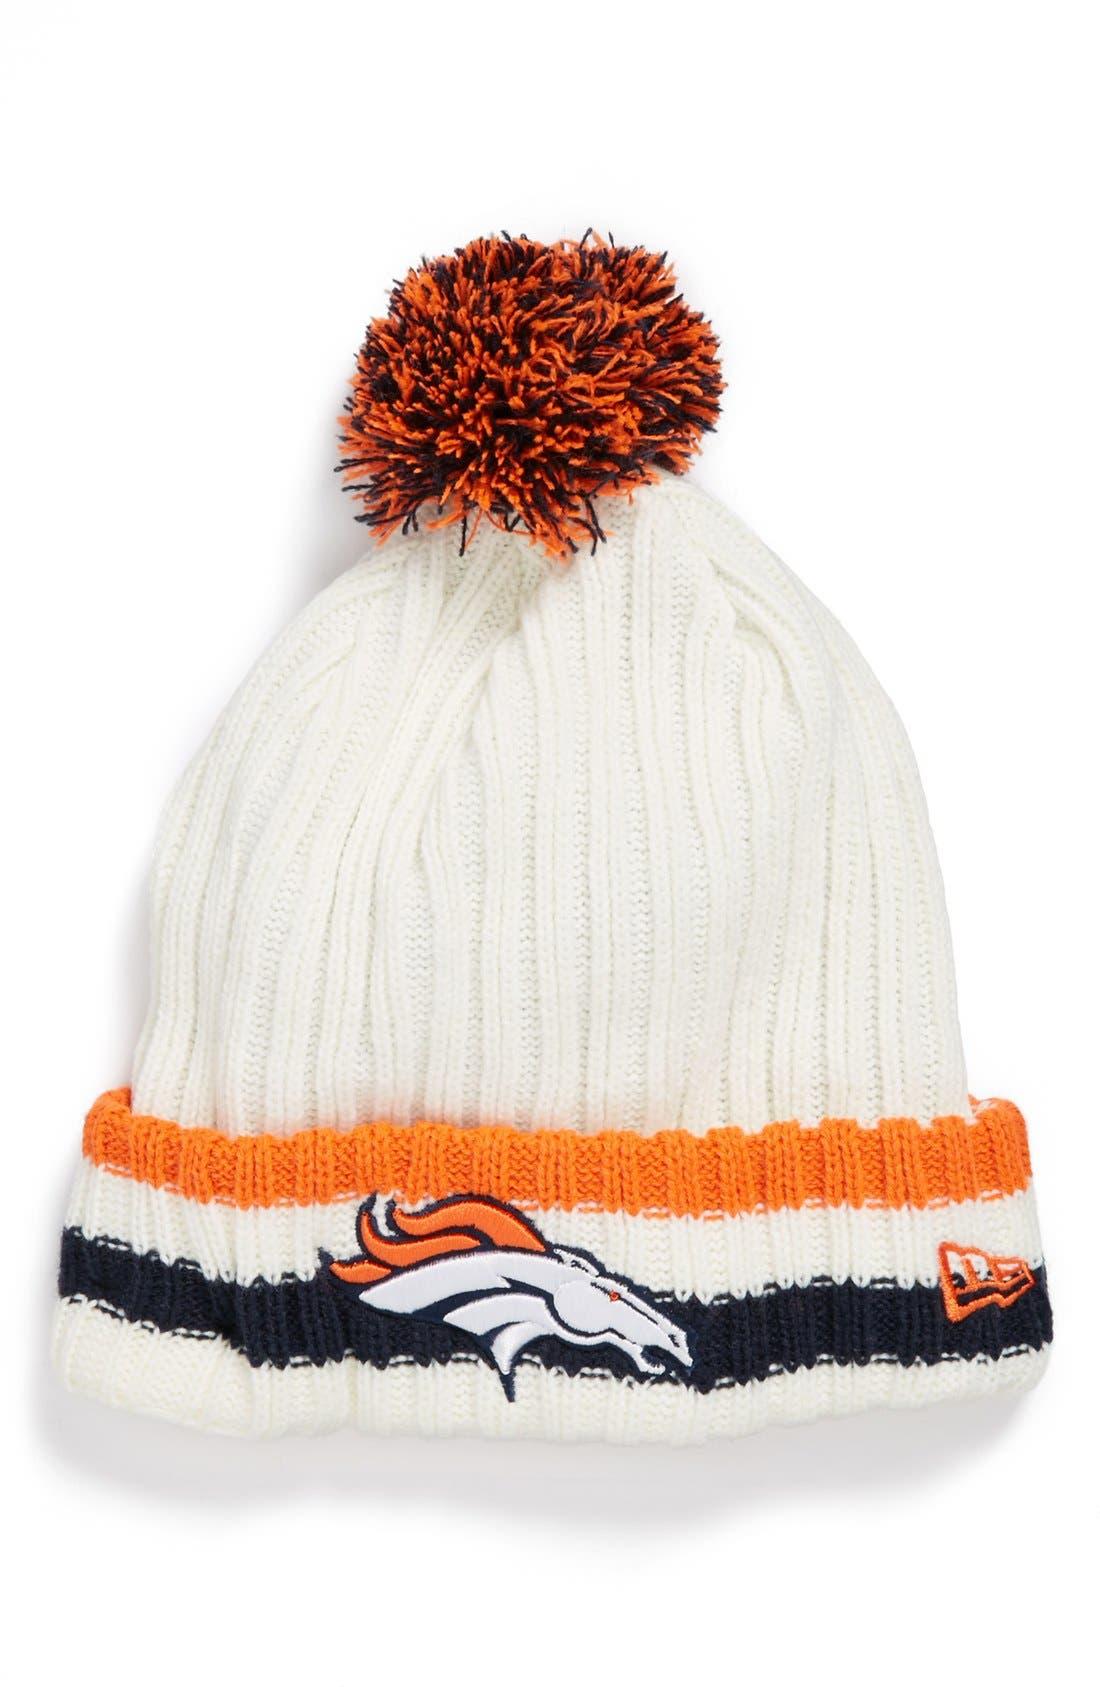 Alternate Image 1 Selected - New Era Cap 'Yesteryear - Denver Broncos' Knit Cap